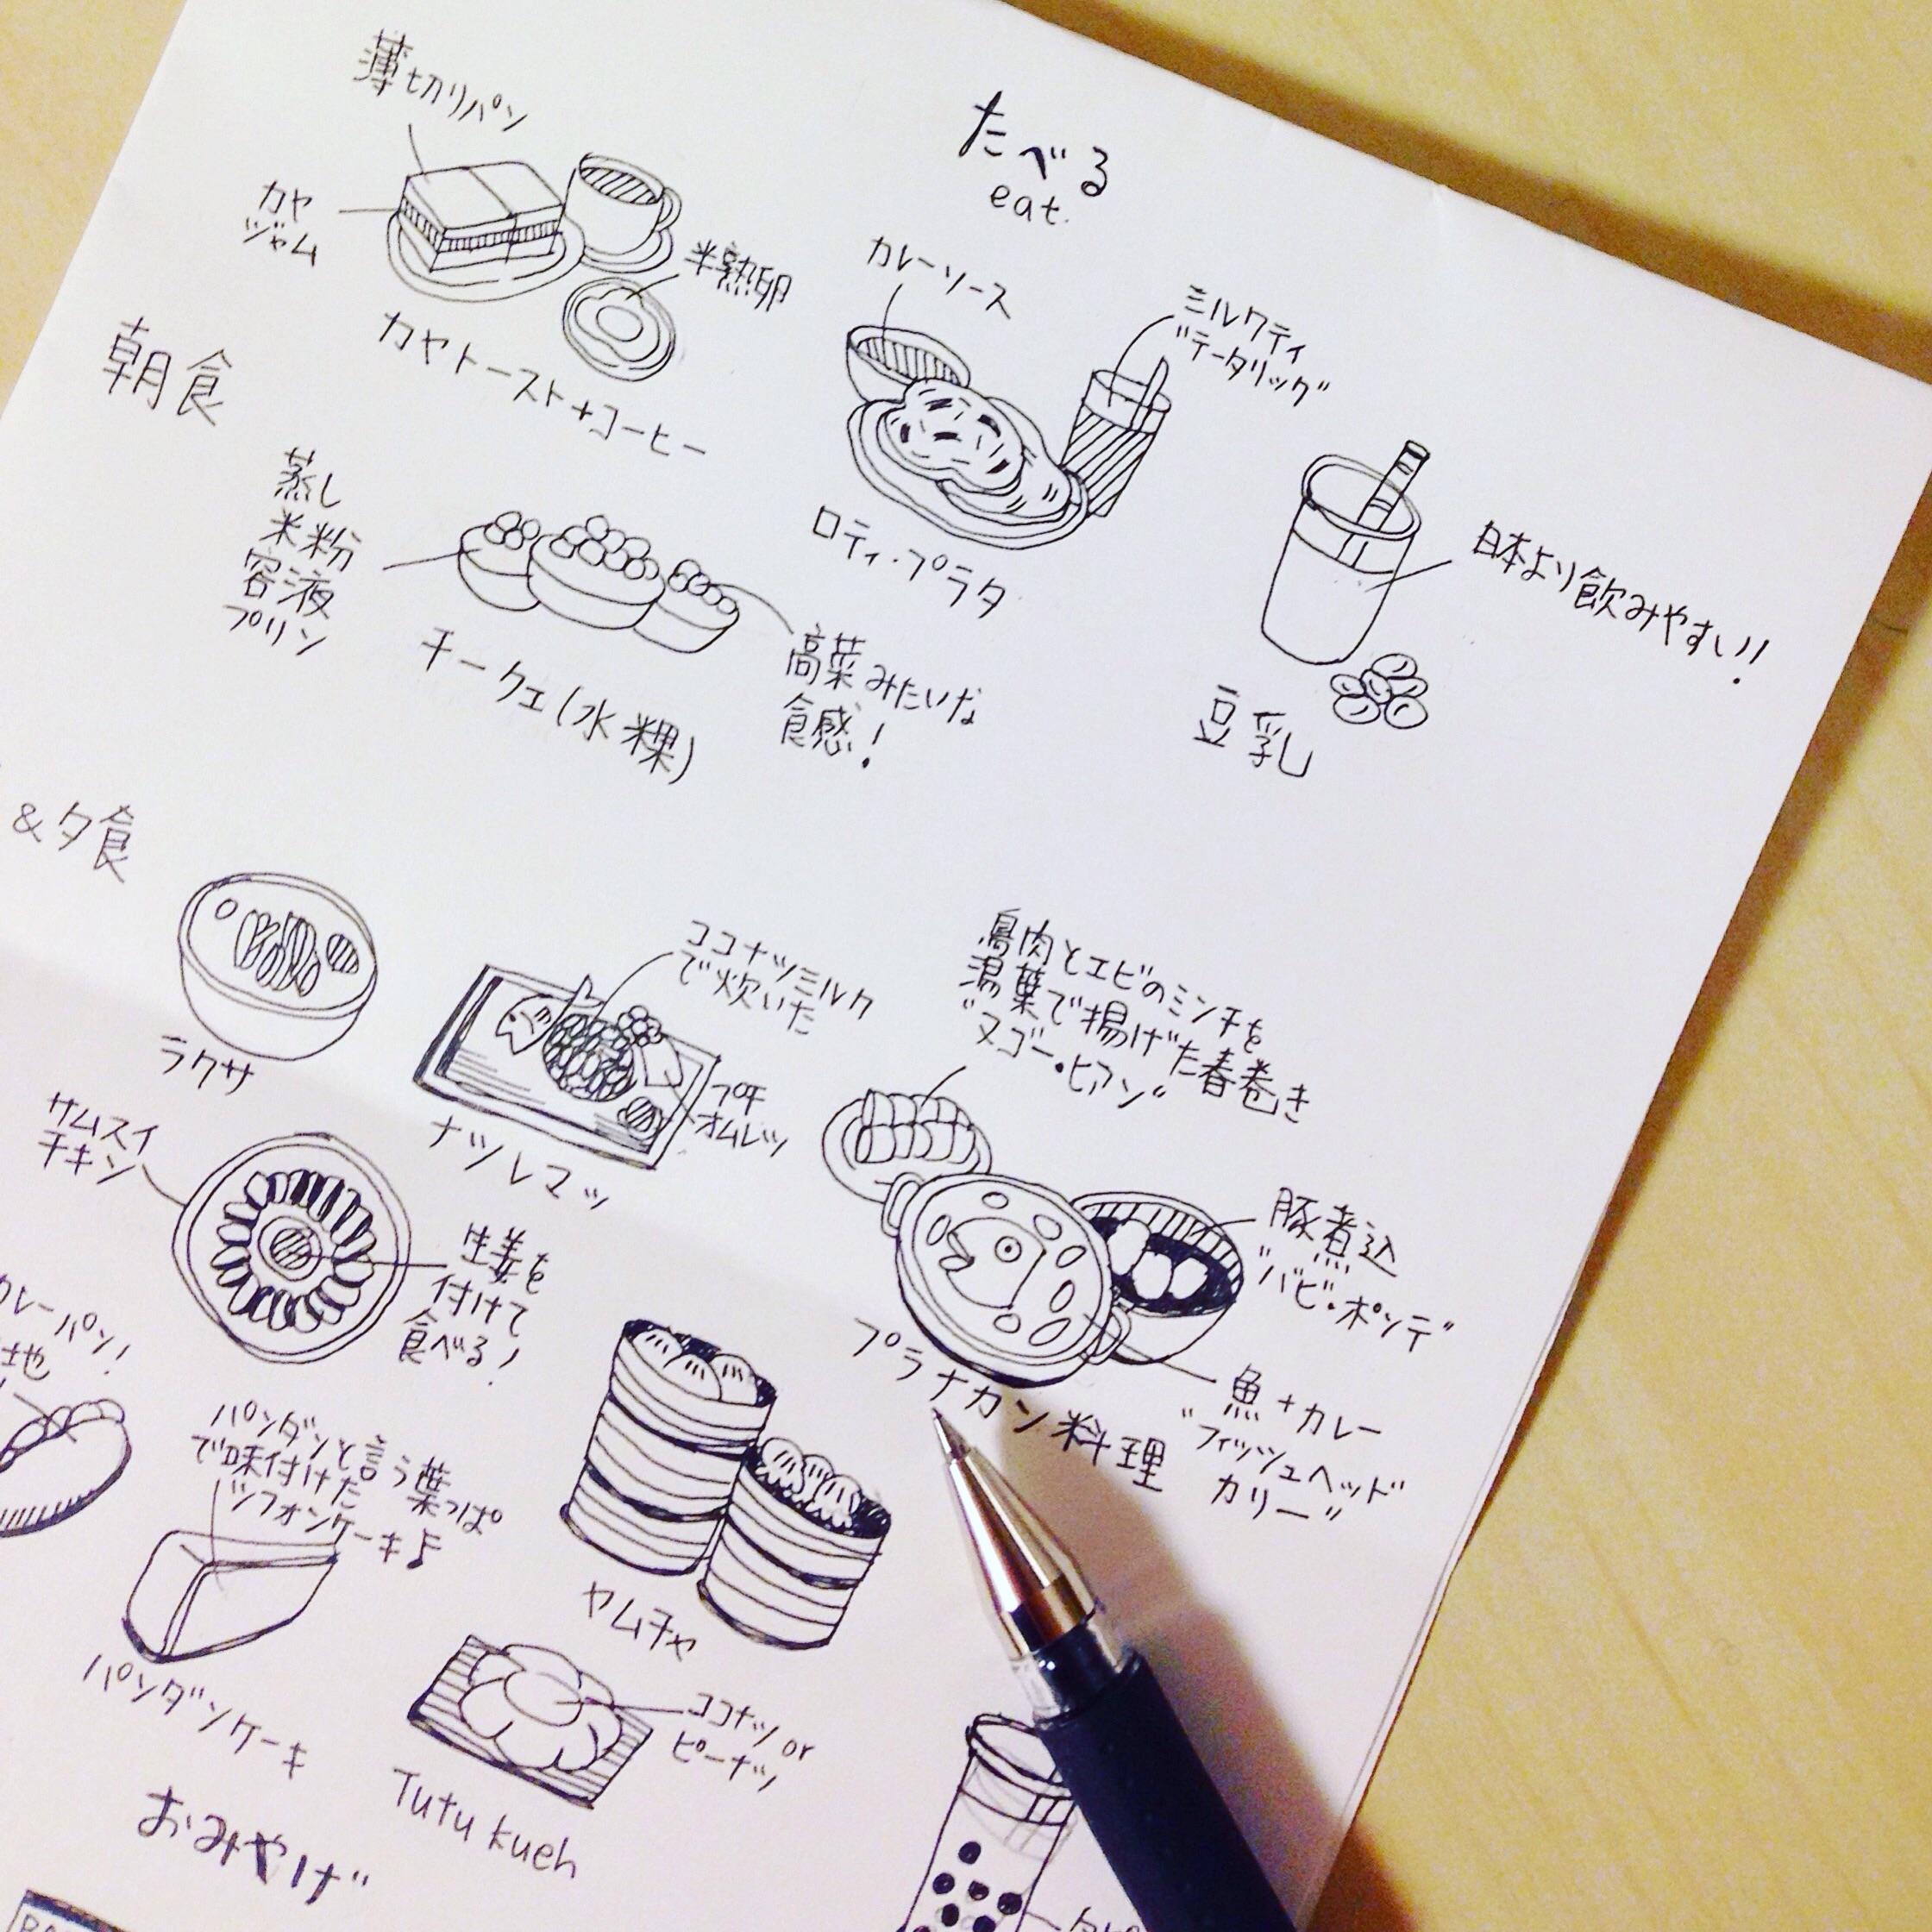 Illustrating my risograph mini zine on Singapore!